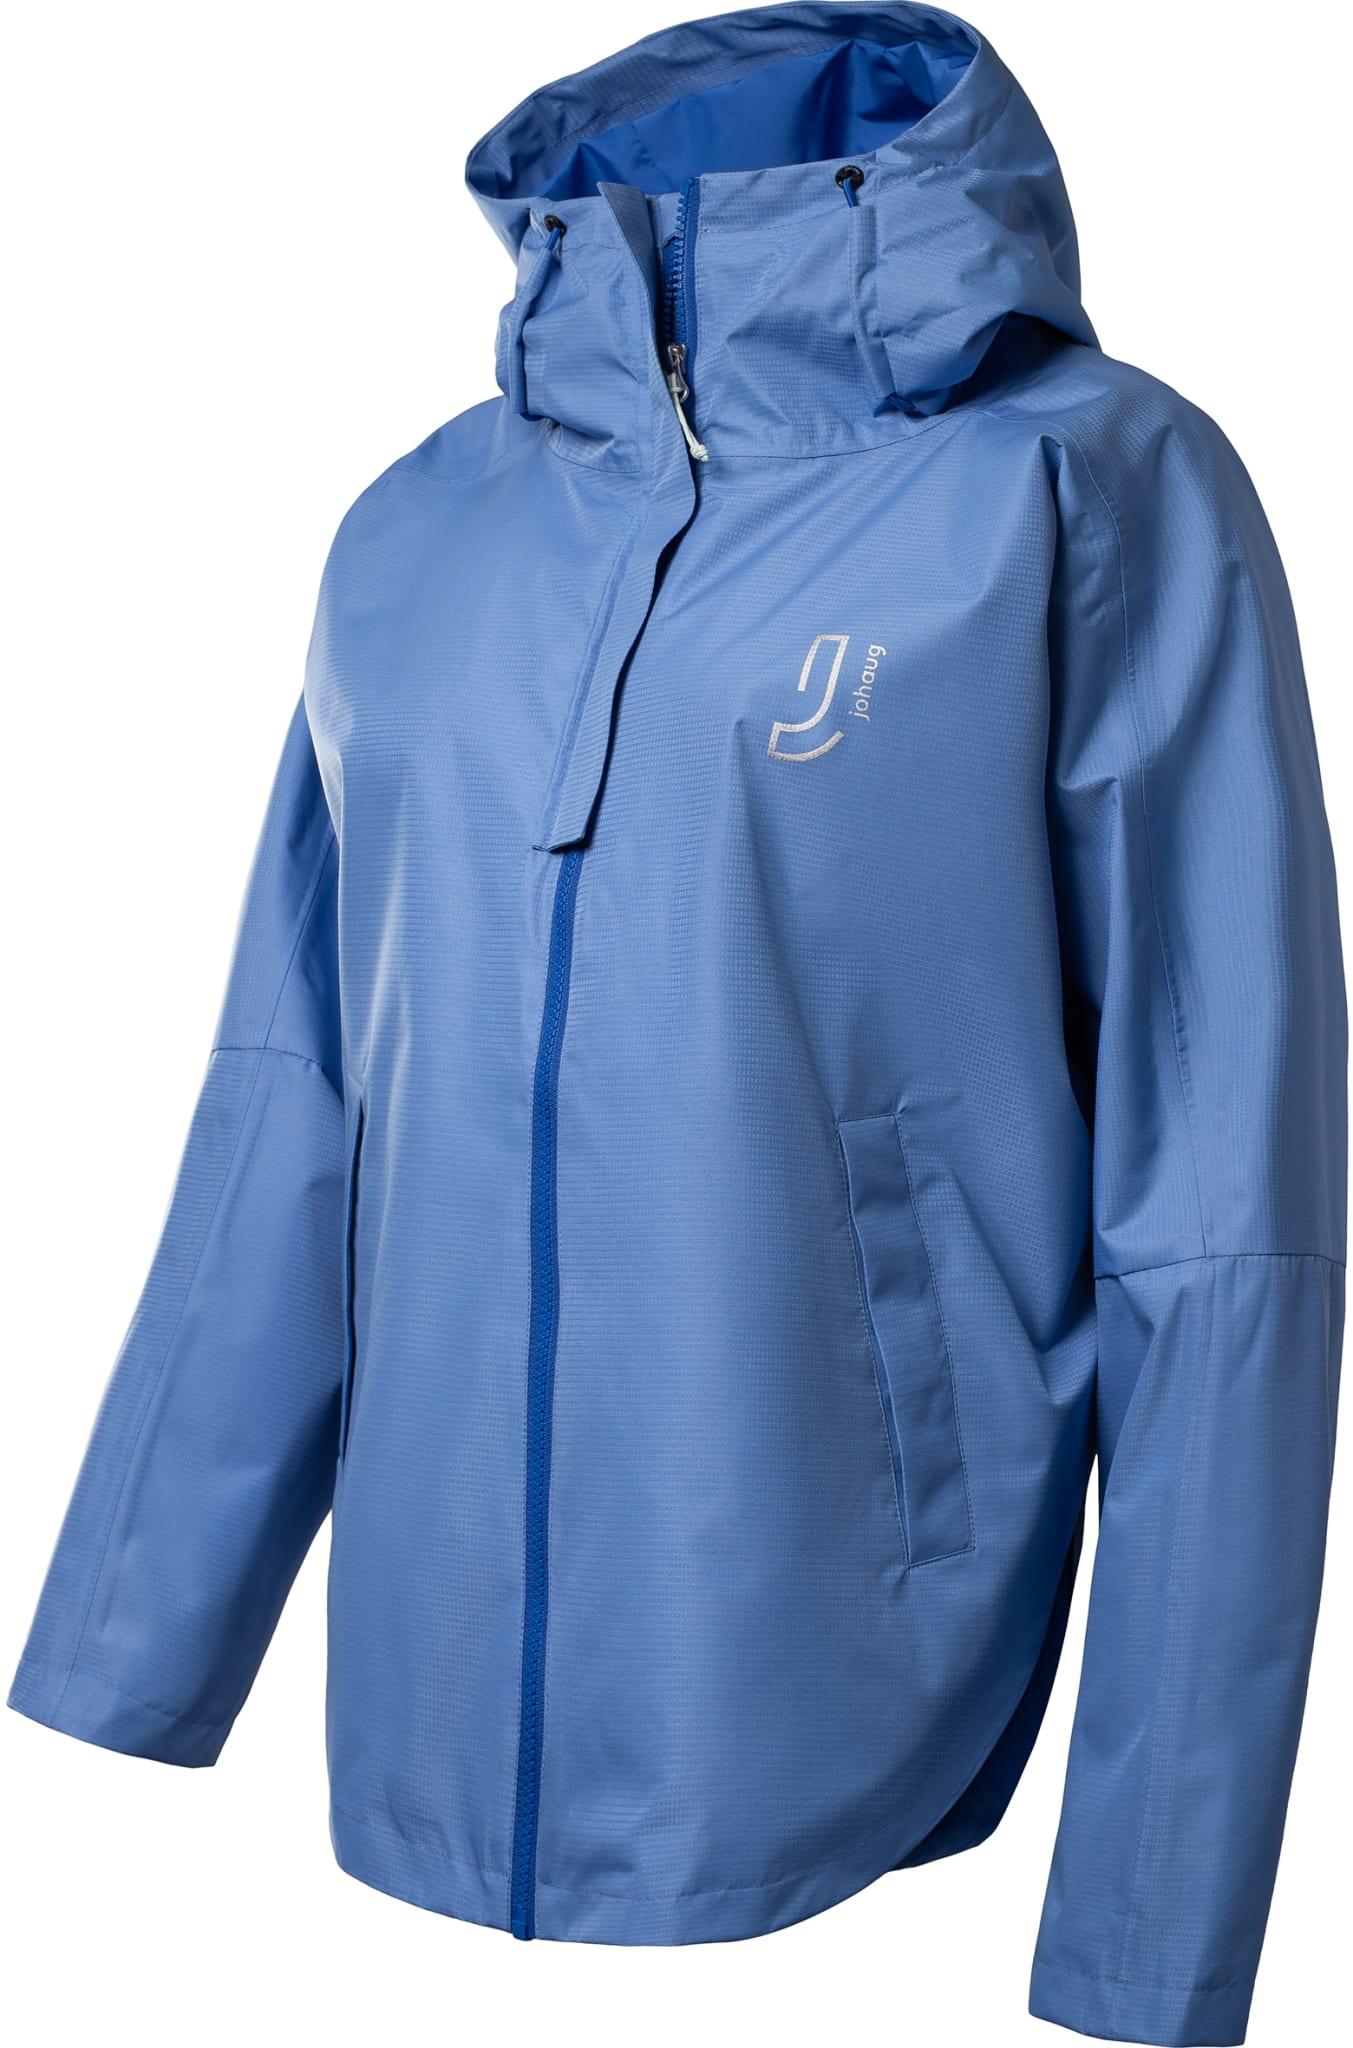 Silhouette Poncho Jacket